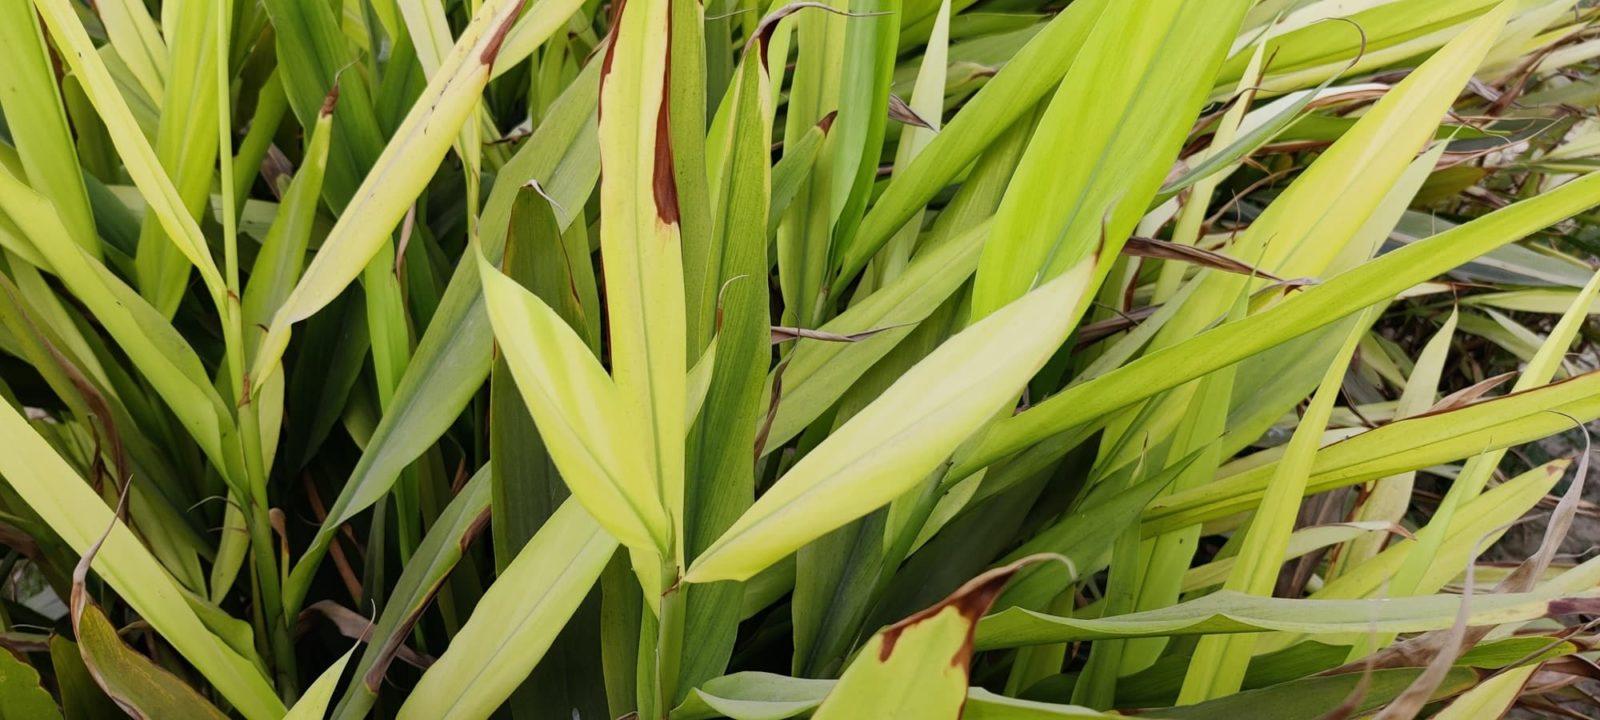 phormium new zealand flax up close